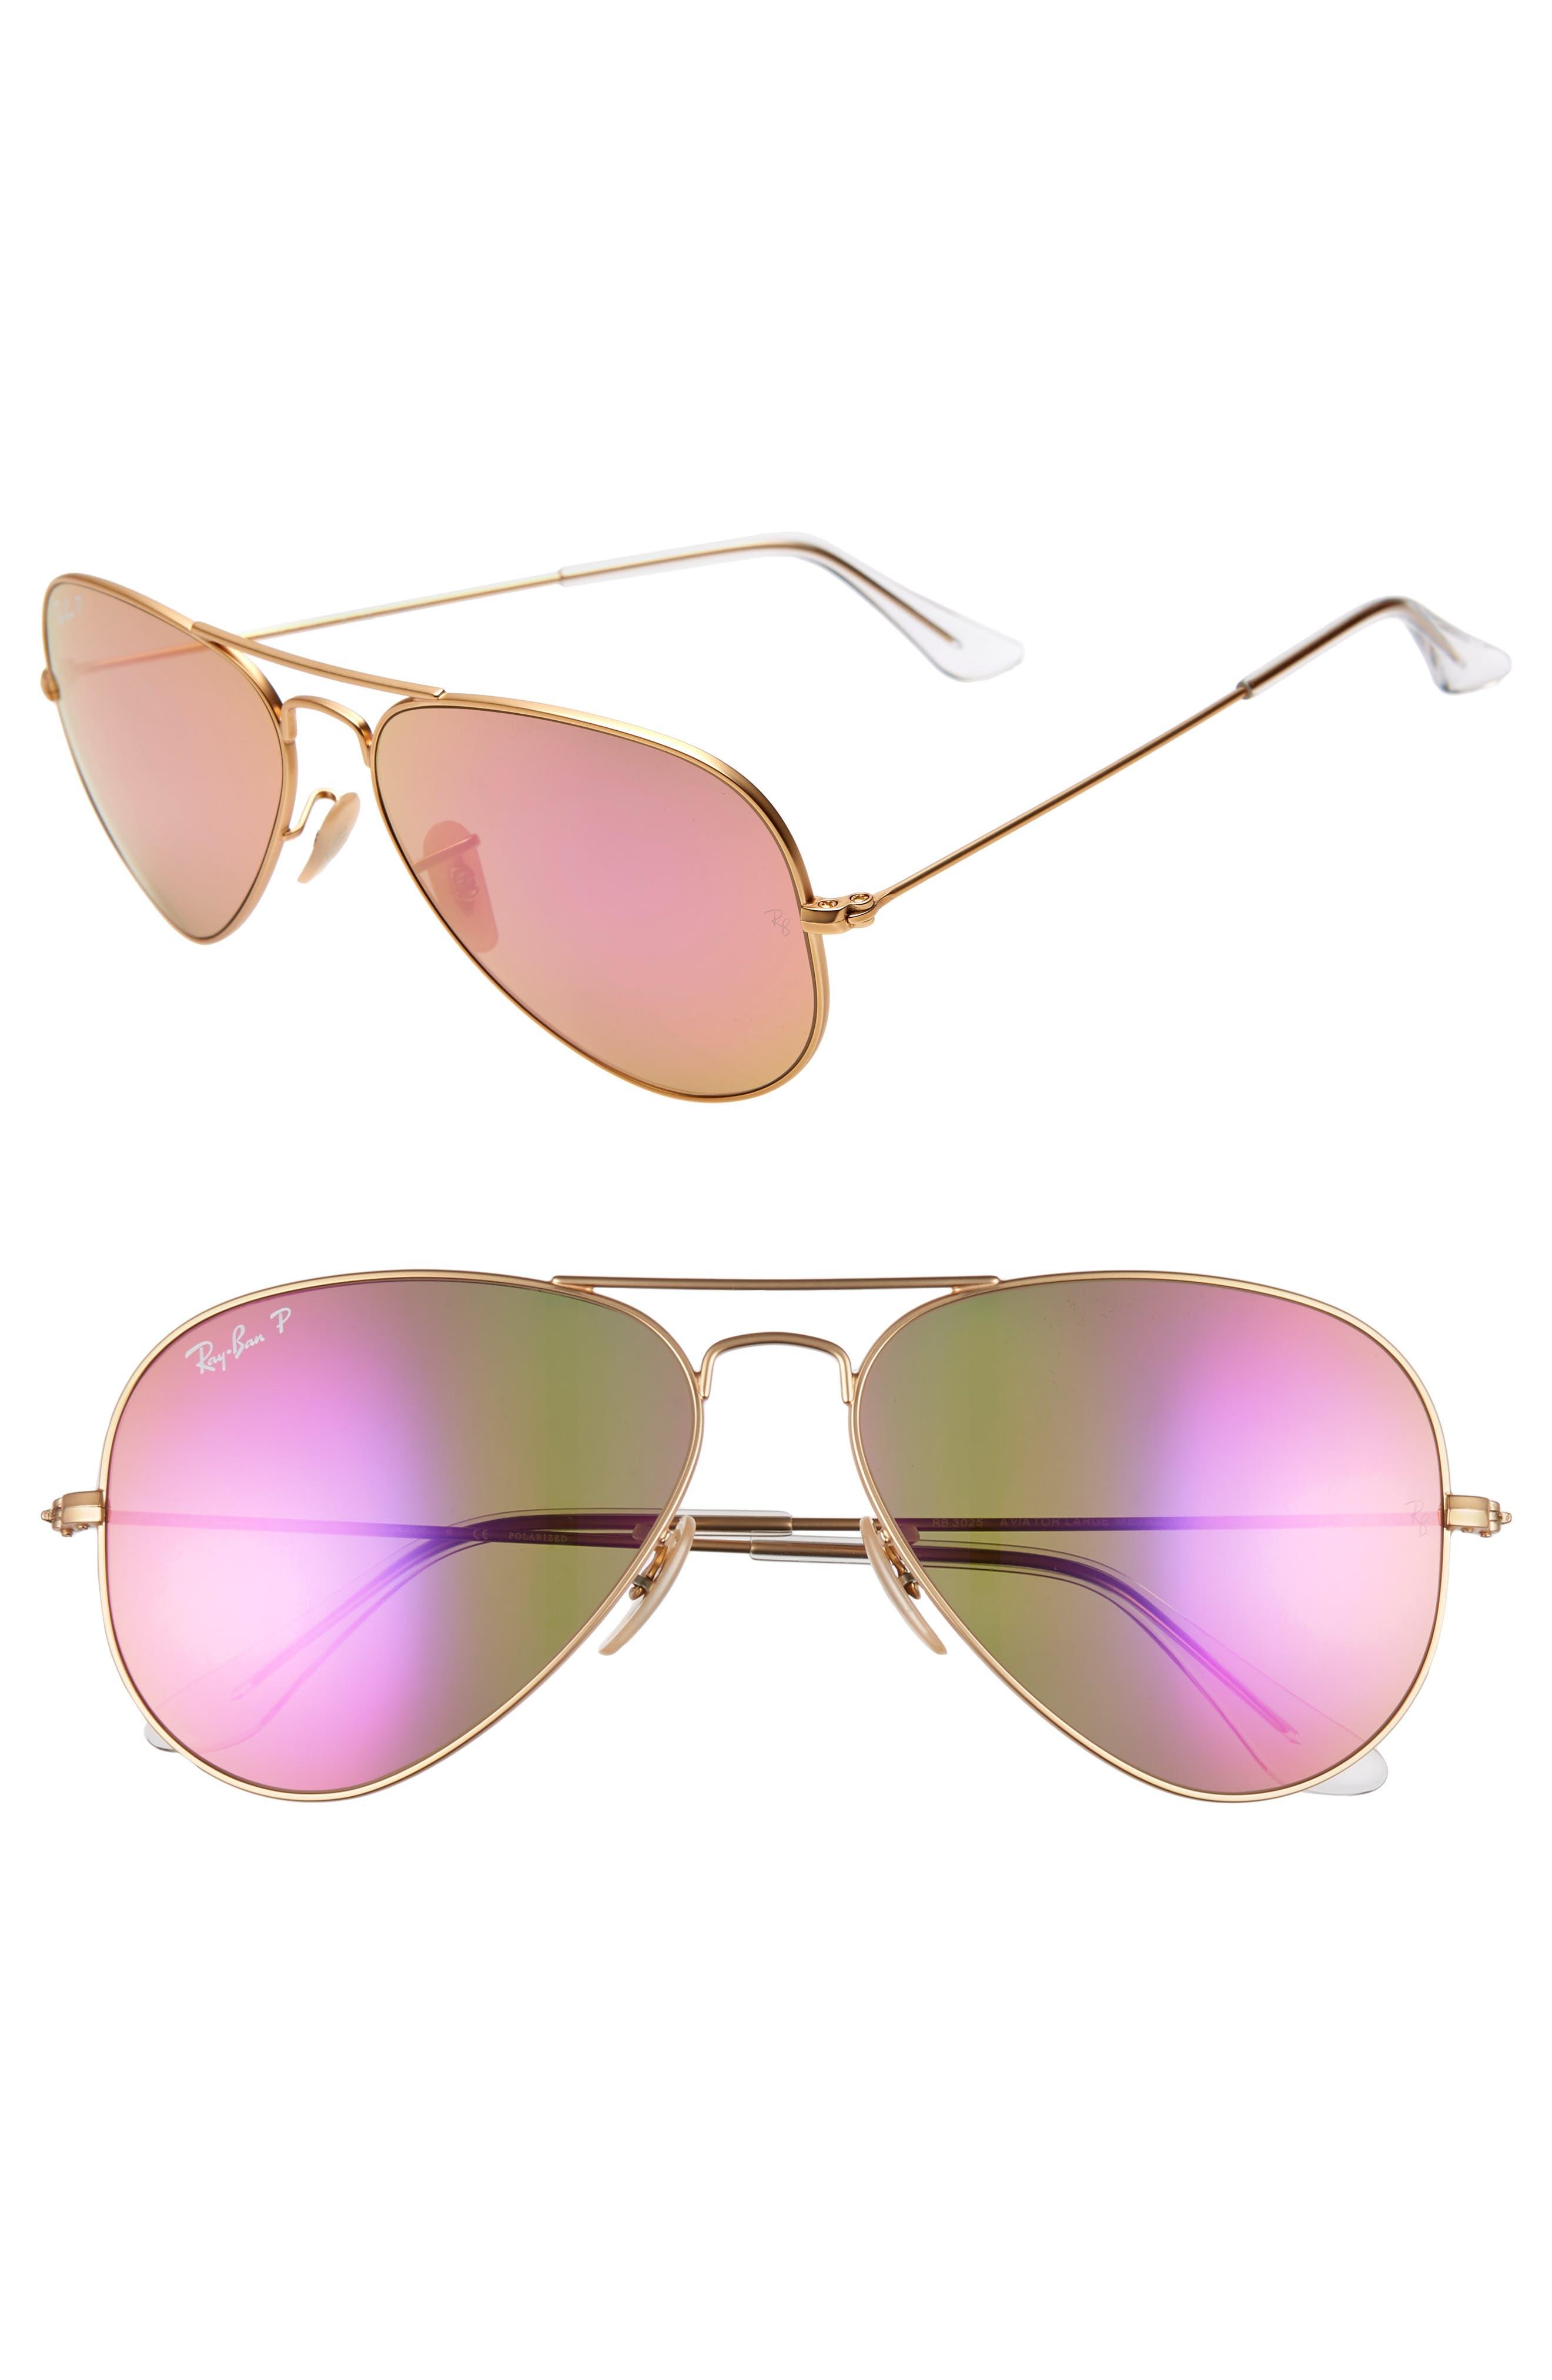 Ray-Ban Standard Icons 5m Mirrored Polarized Aviator Sunglasses - Gold/ Pink Mirror